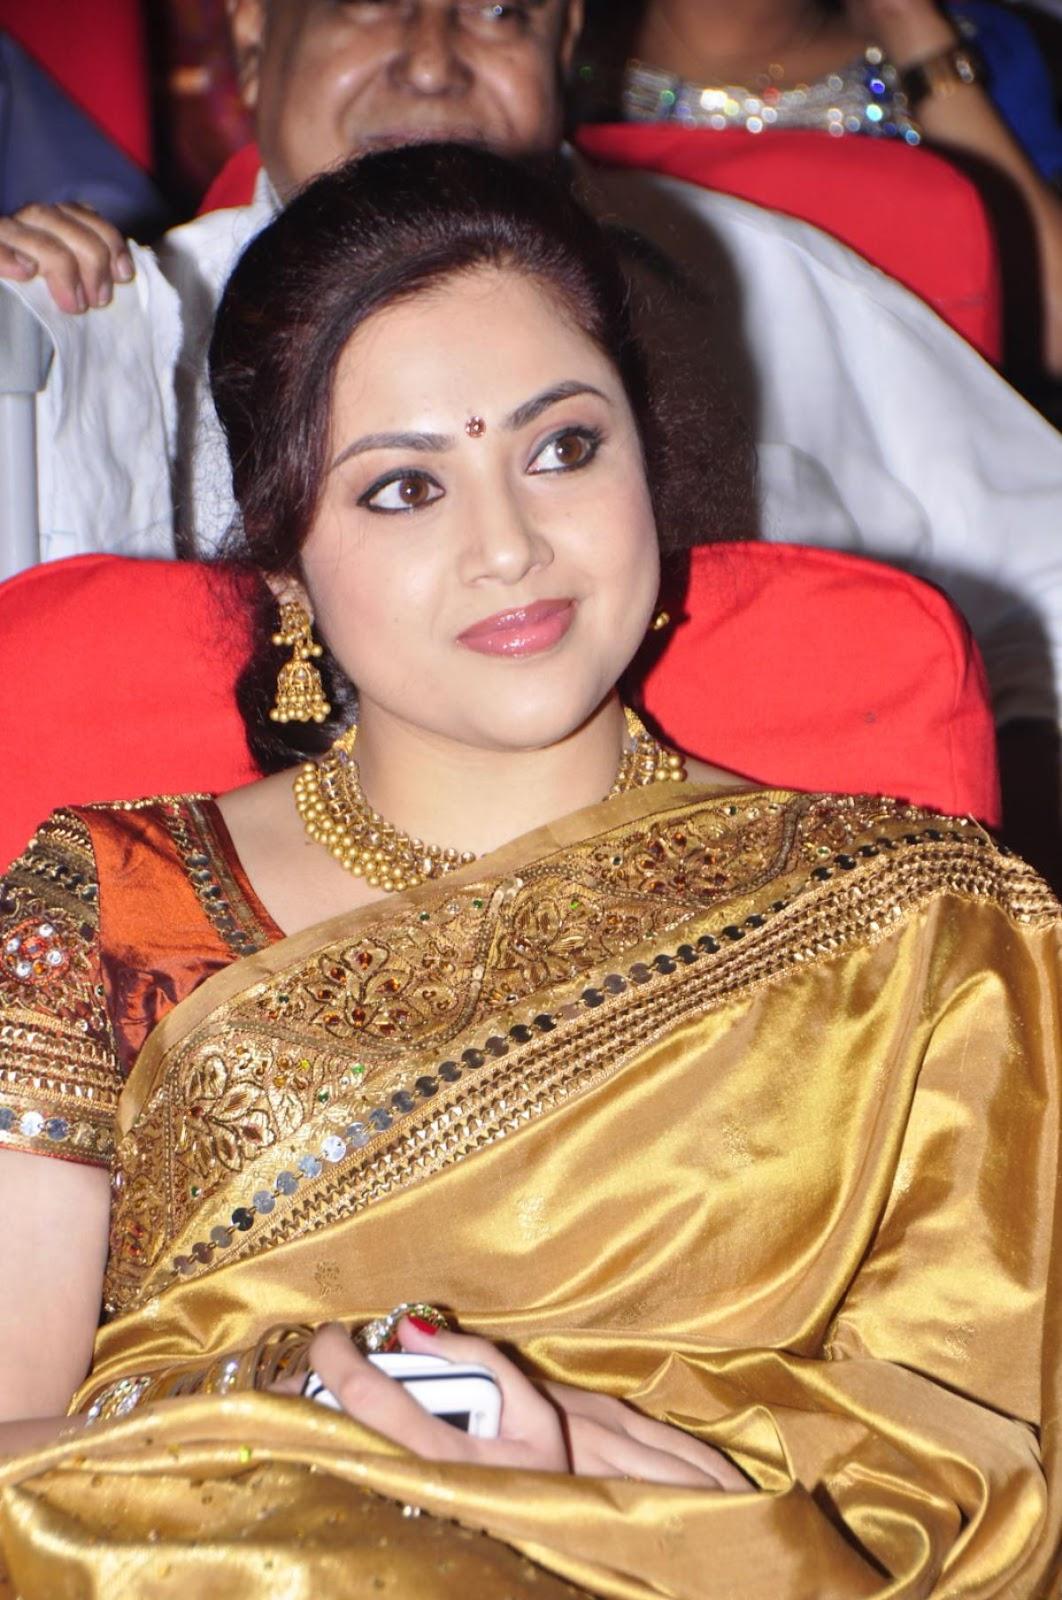 meena hot saree images